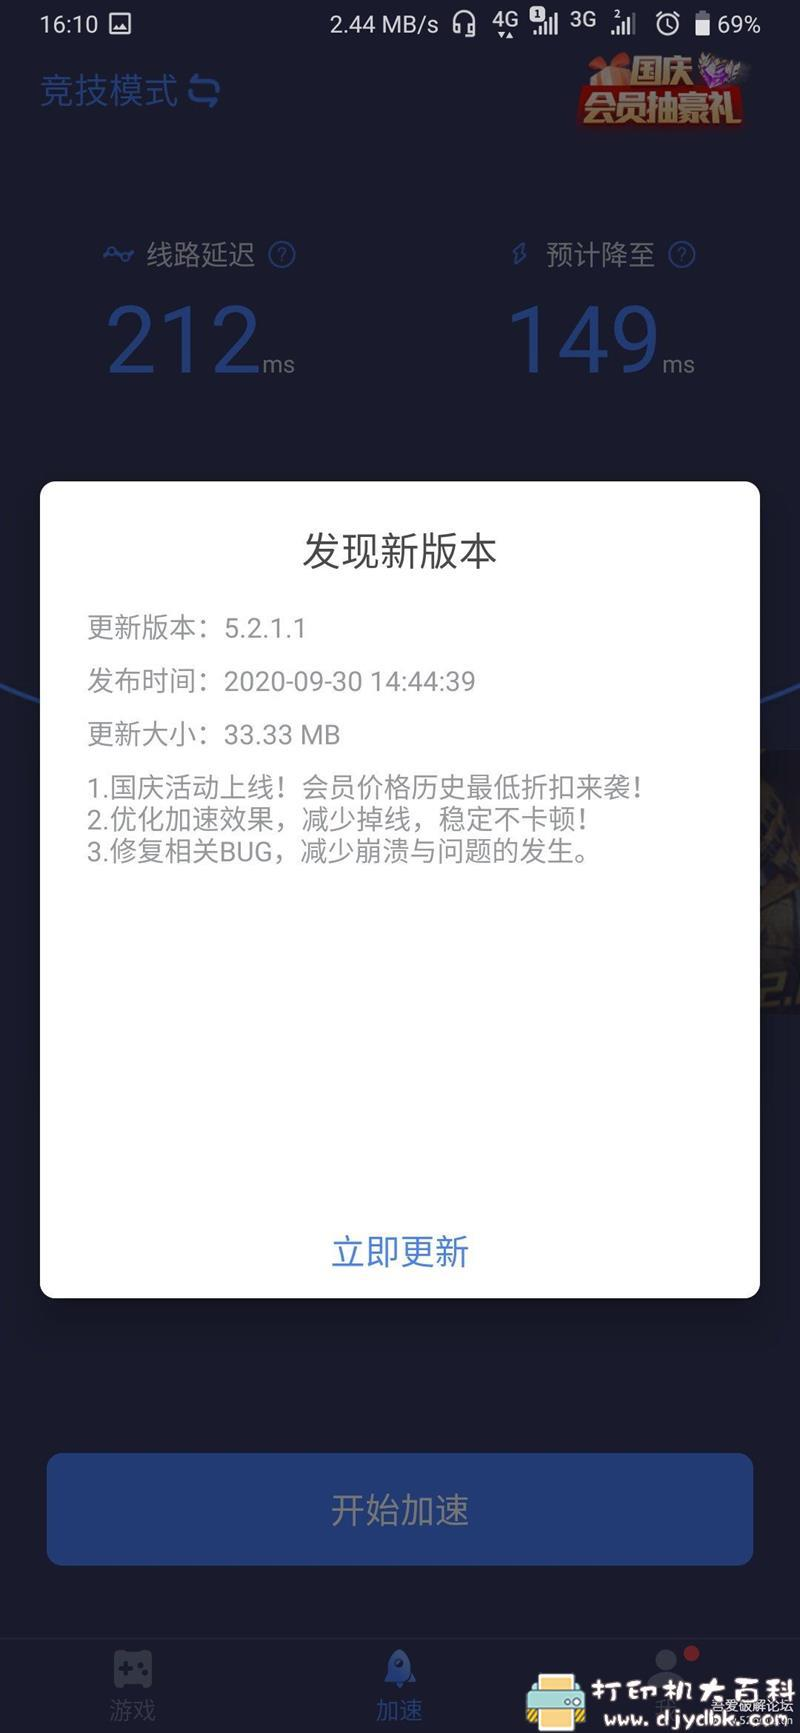 [Android]利用对话框取消2.3.5绕过软件更新 配图 No.1